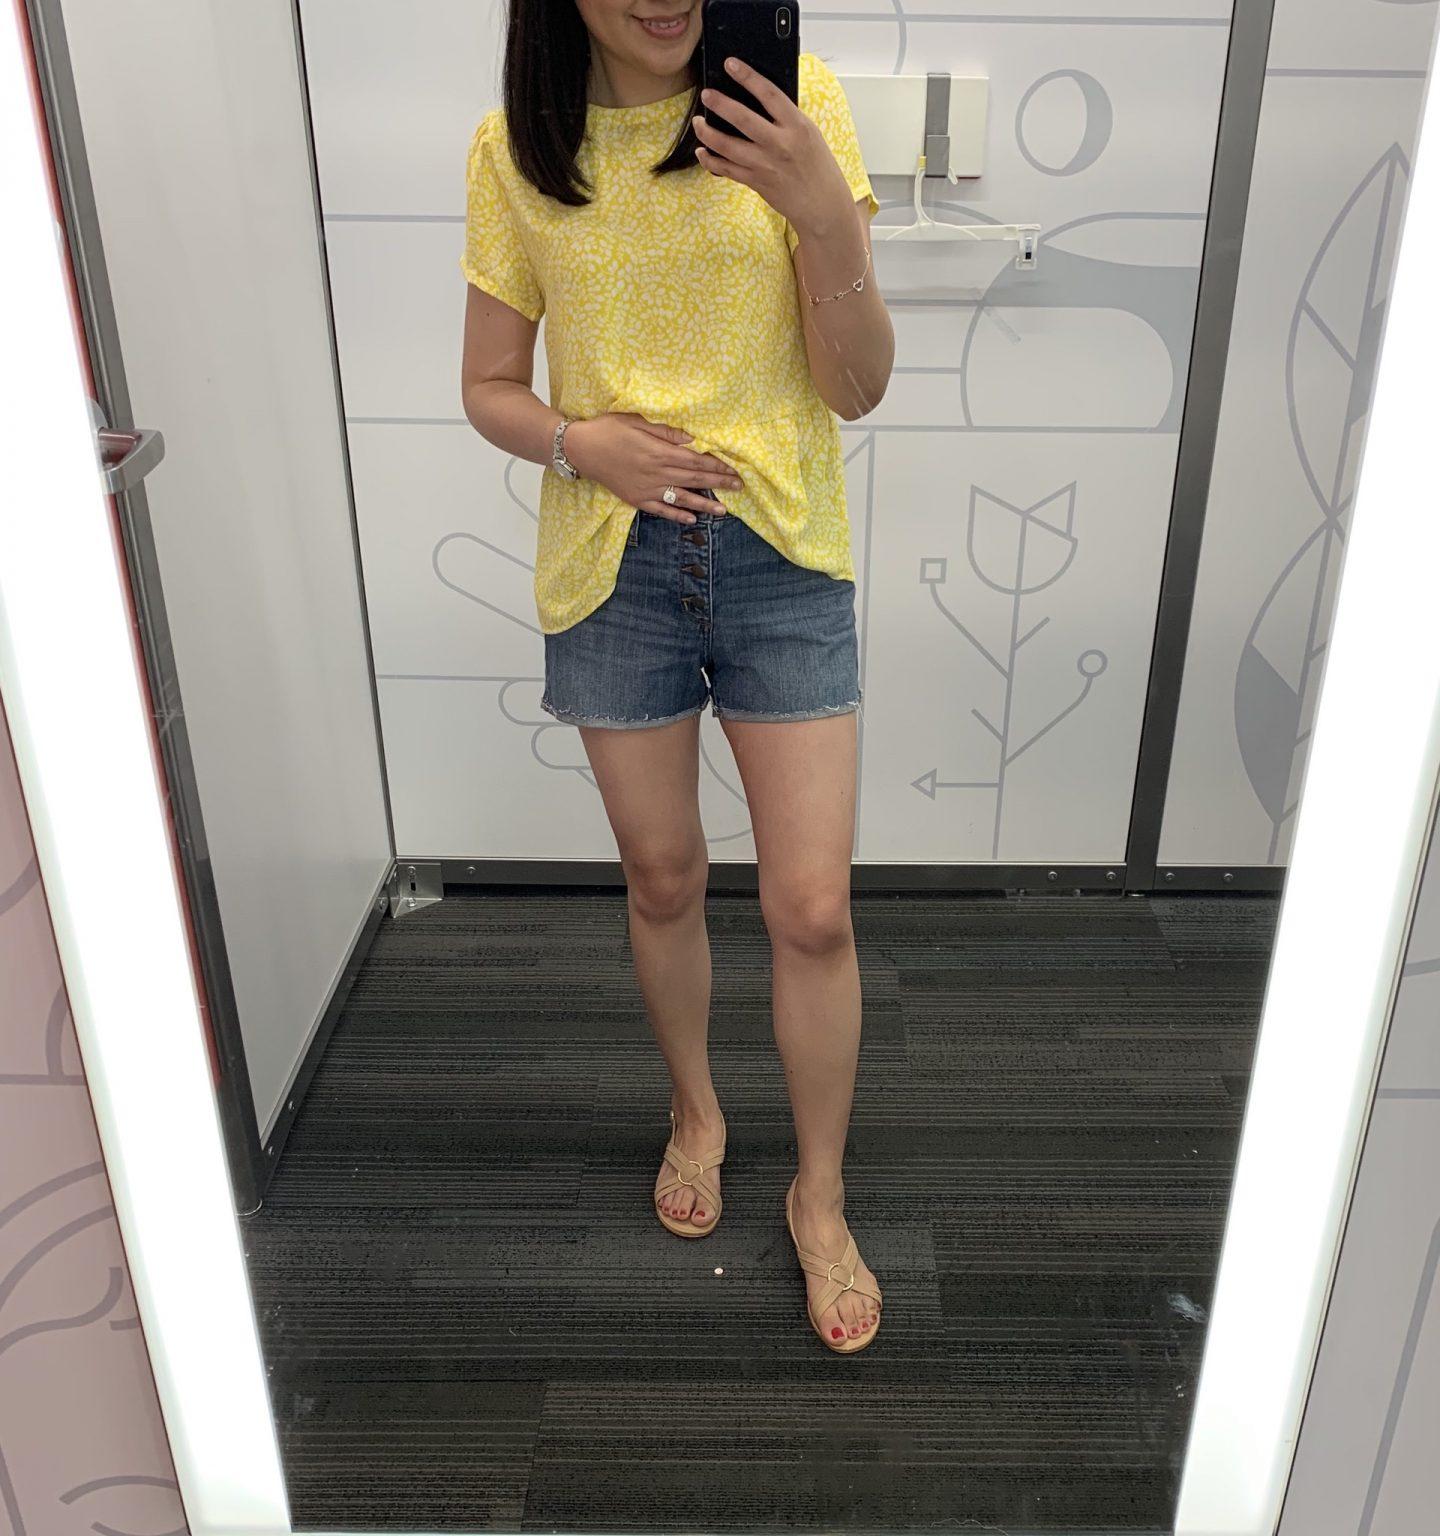 Universal Thread High-Rise Jean Shorts in Medium Wash, size 0